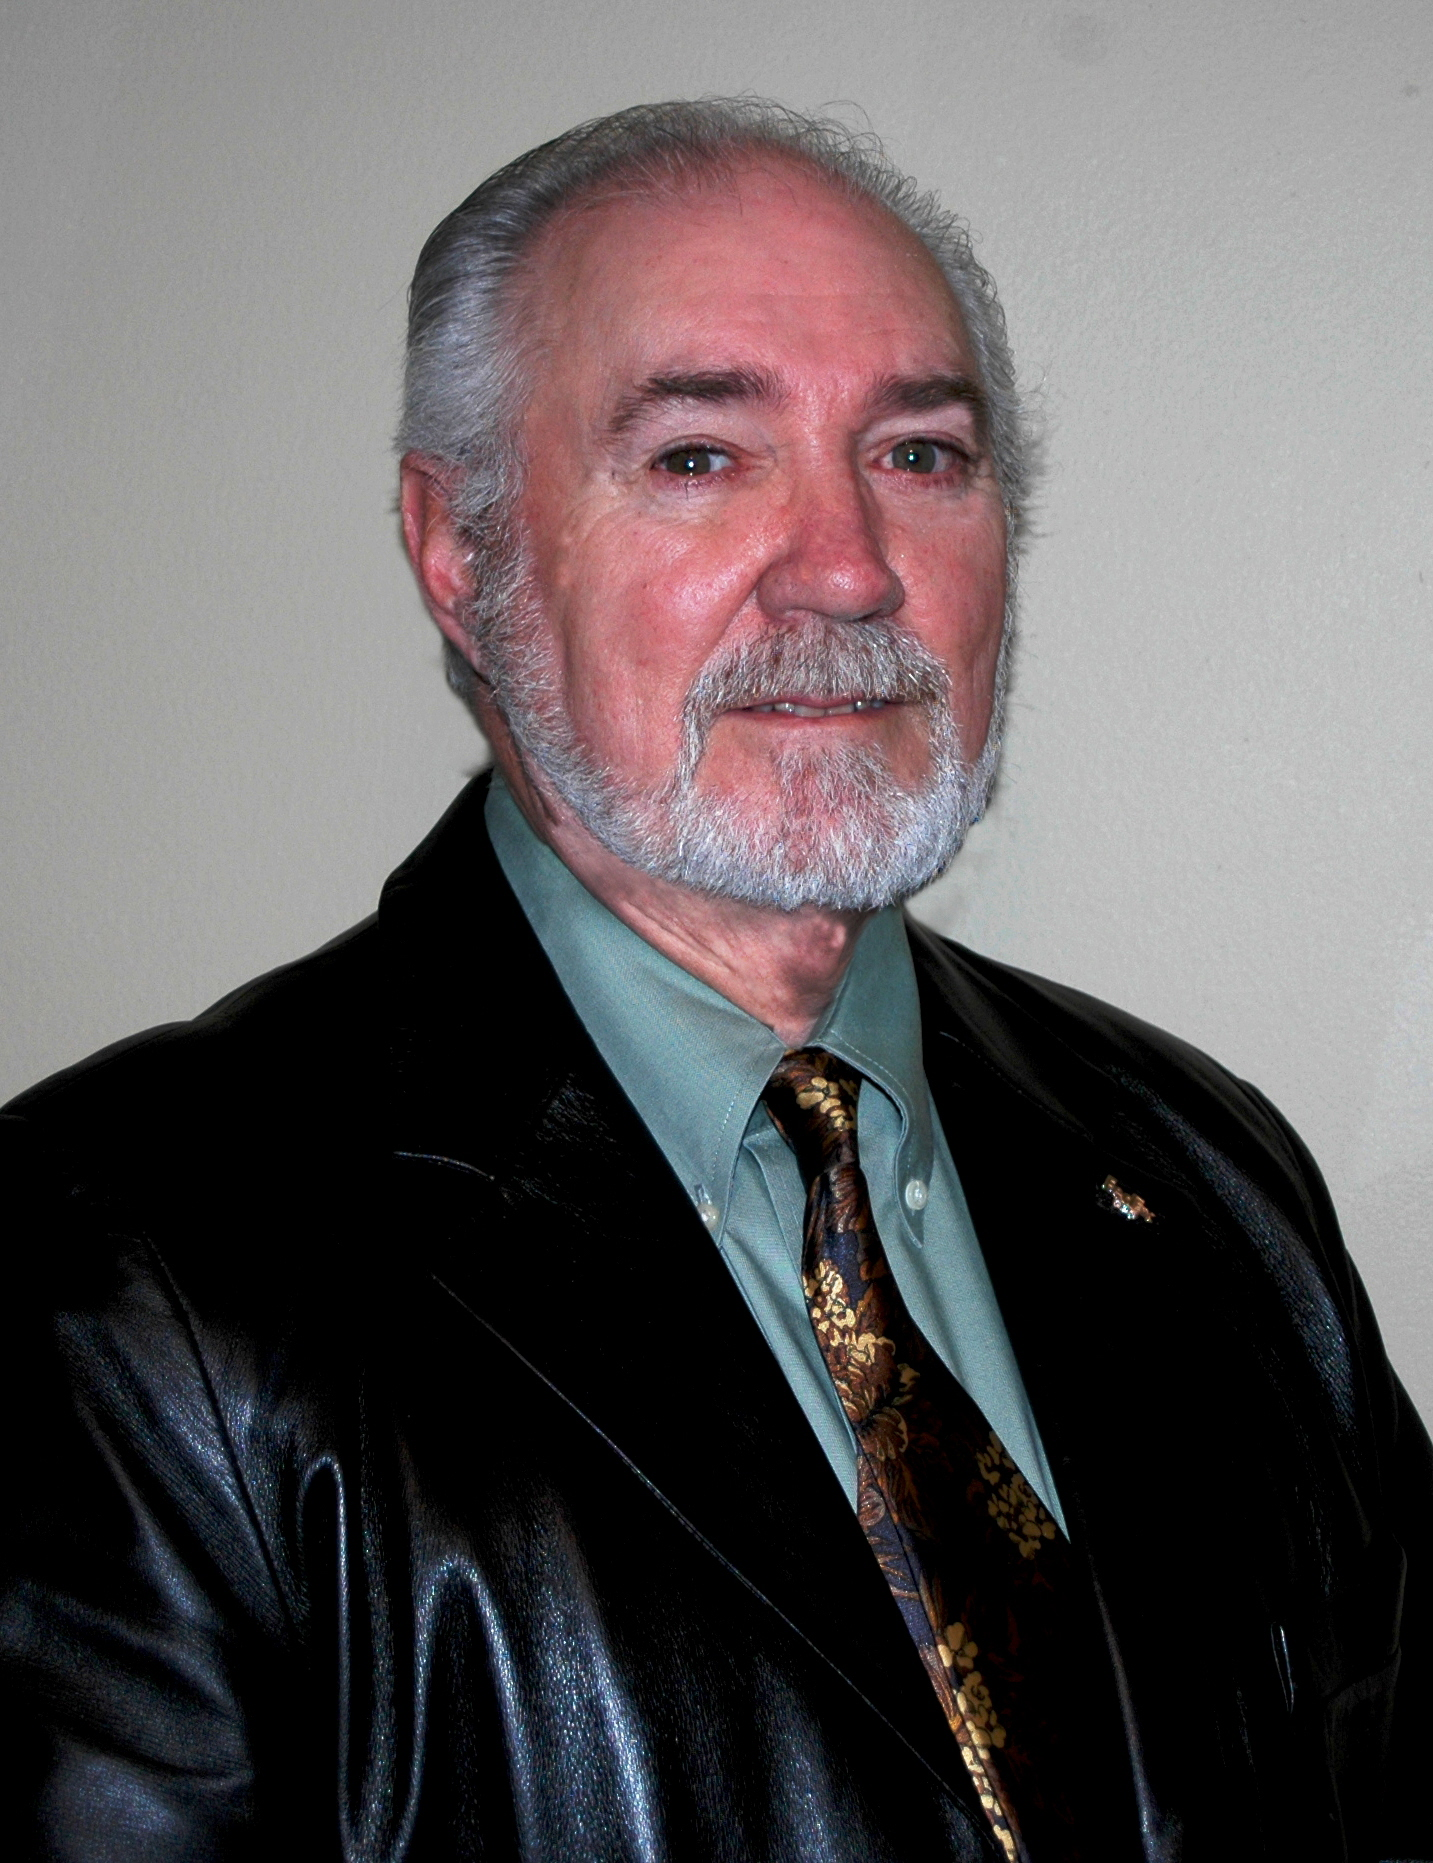 Mike Babineauz